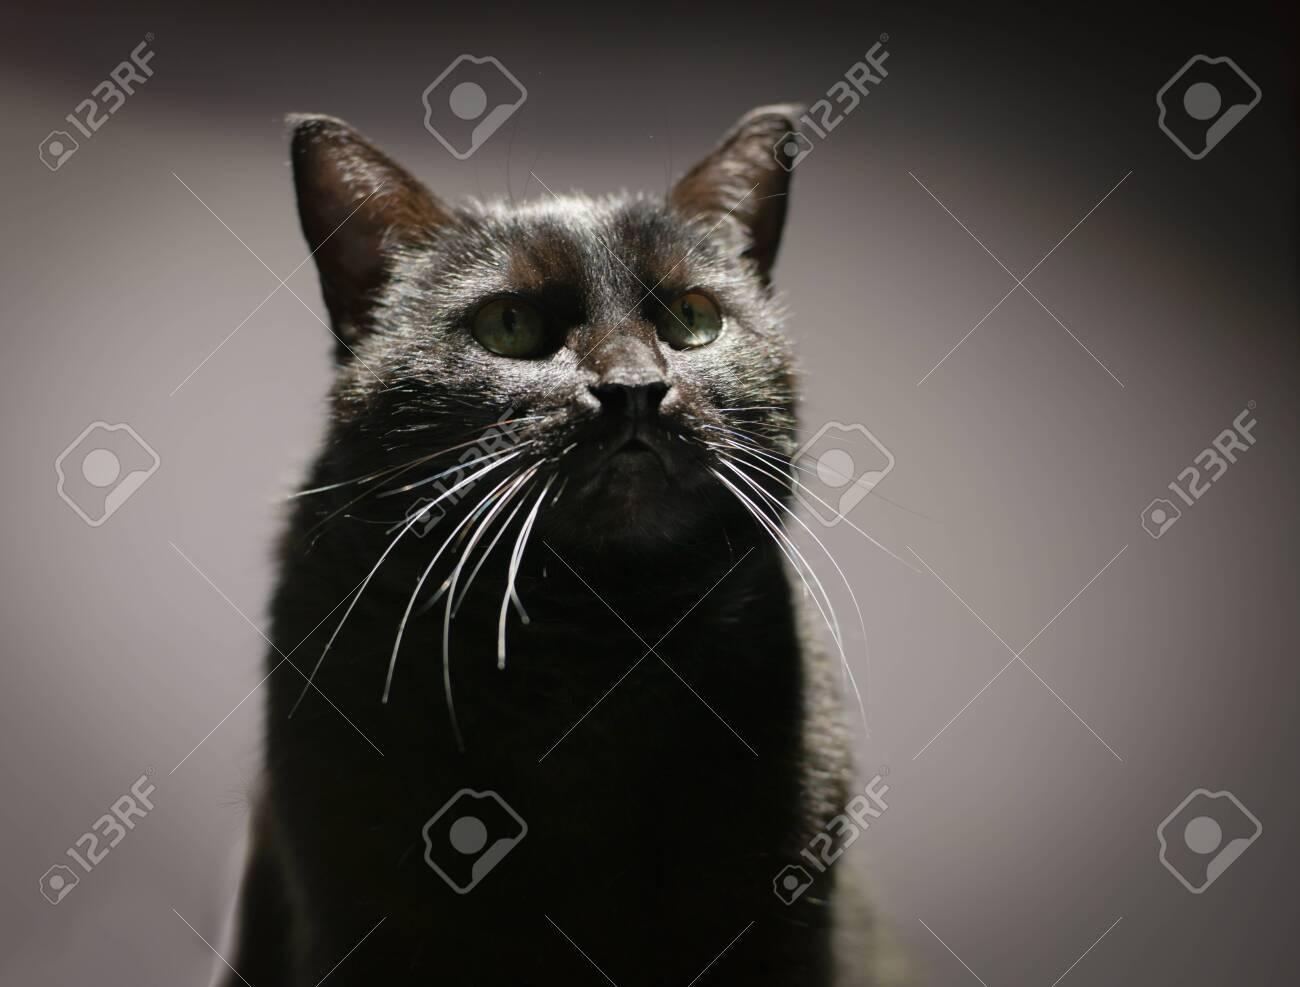 Cat portrait with a faithful stupid look. - 129404710